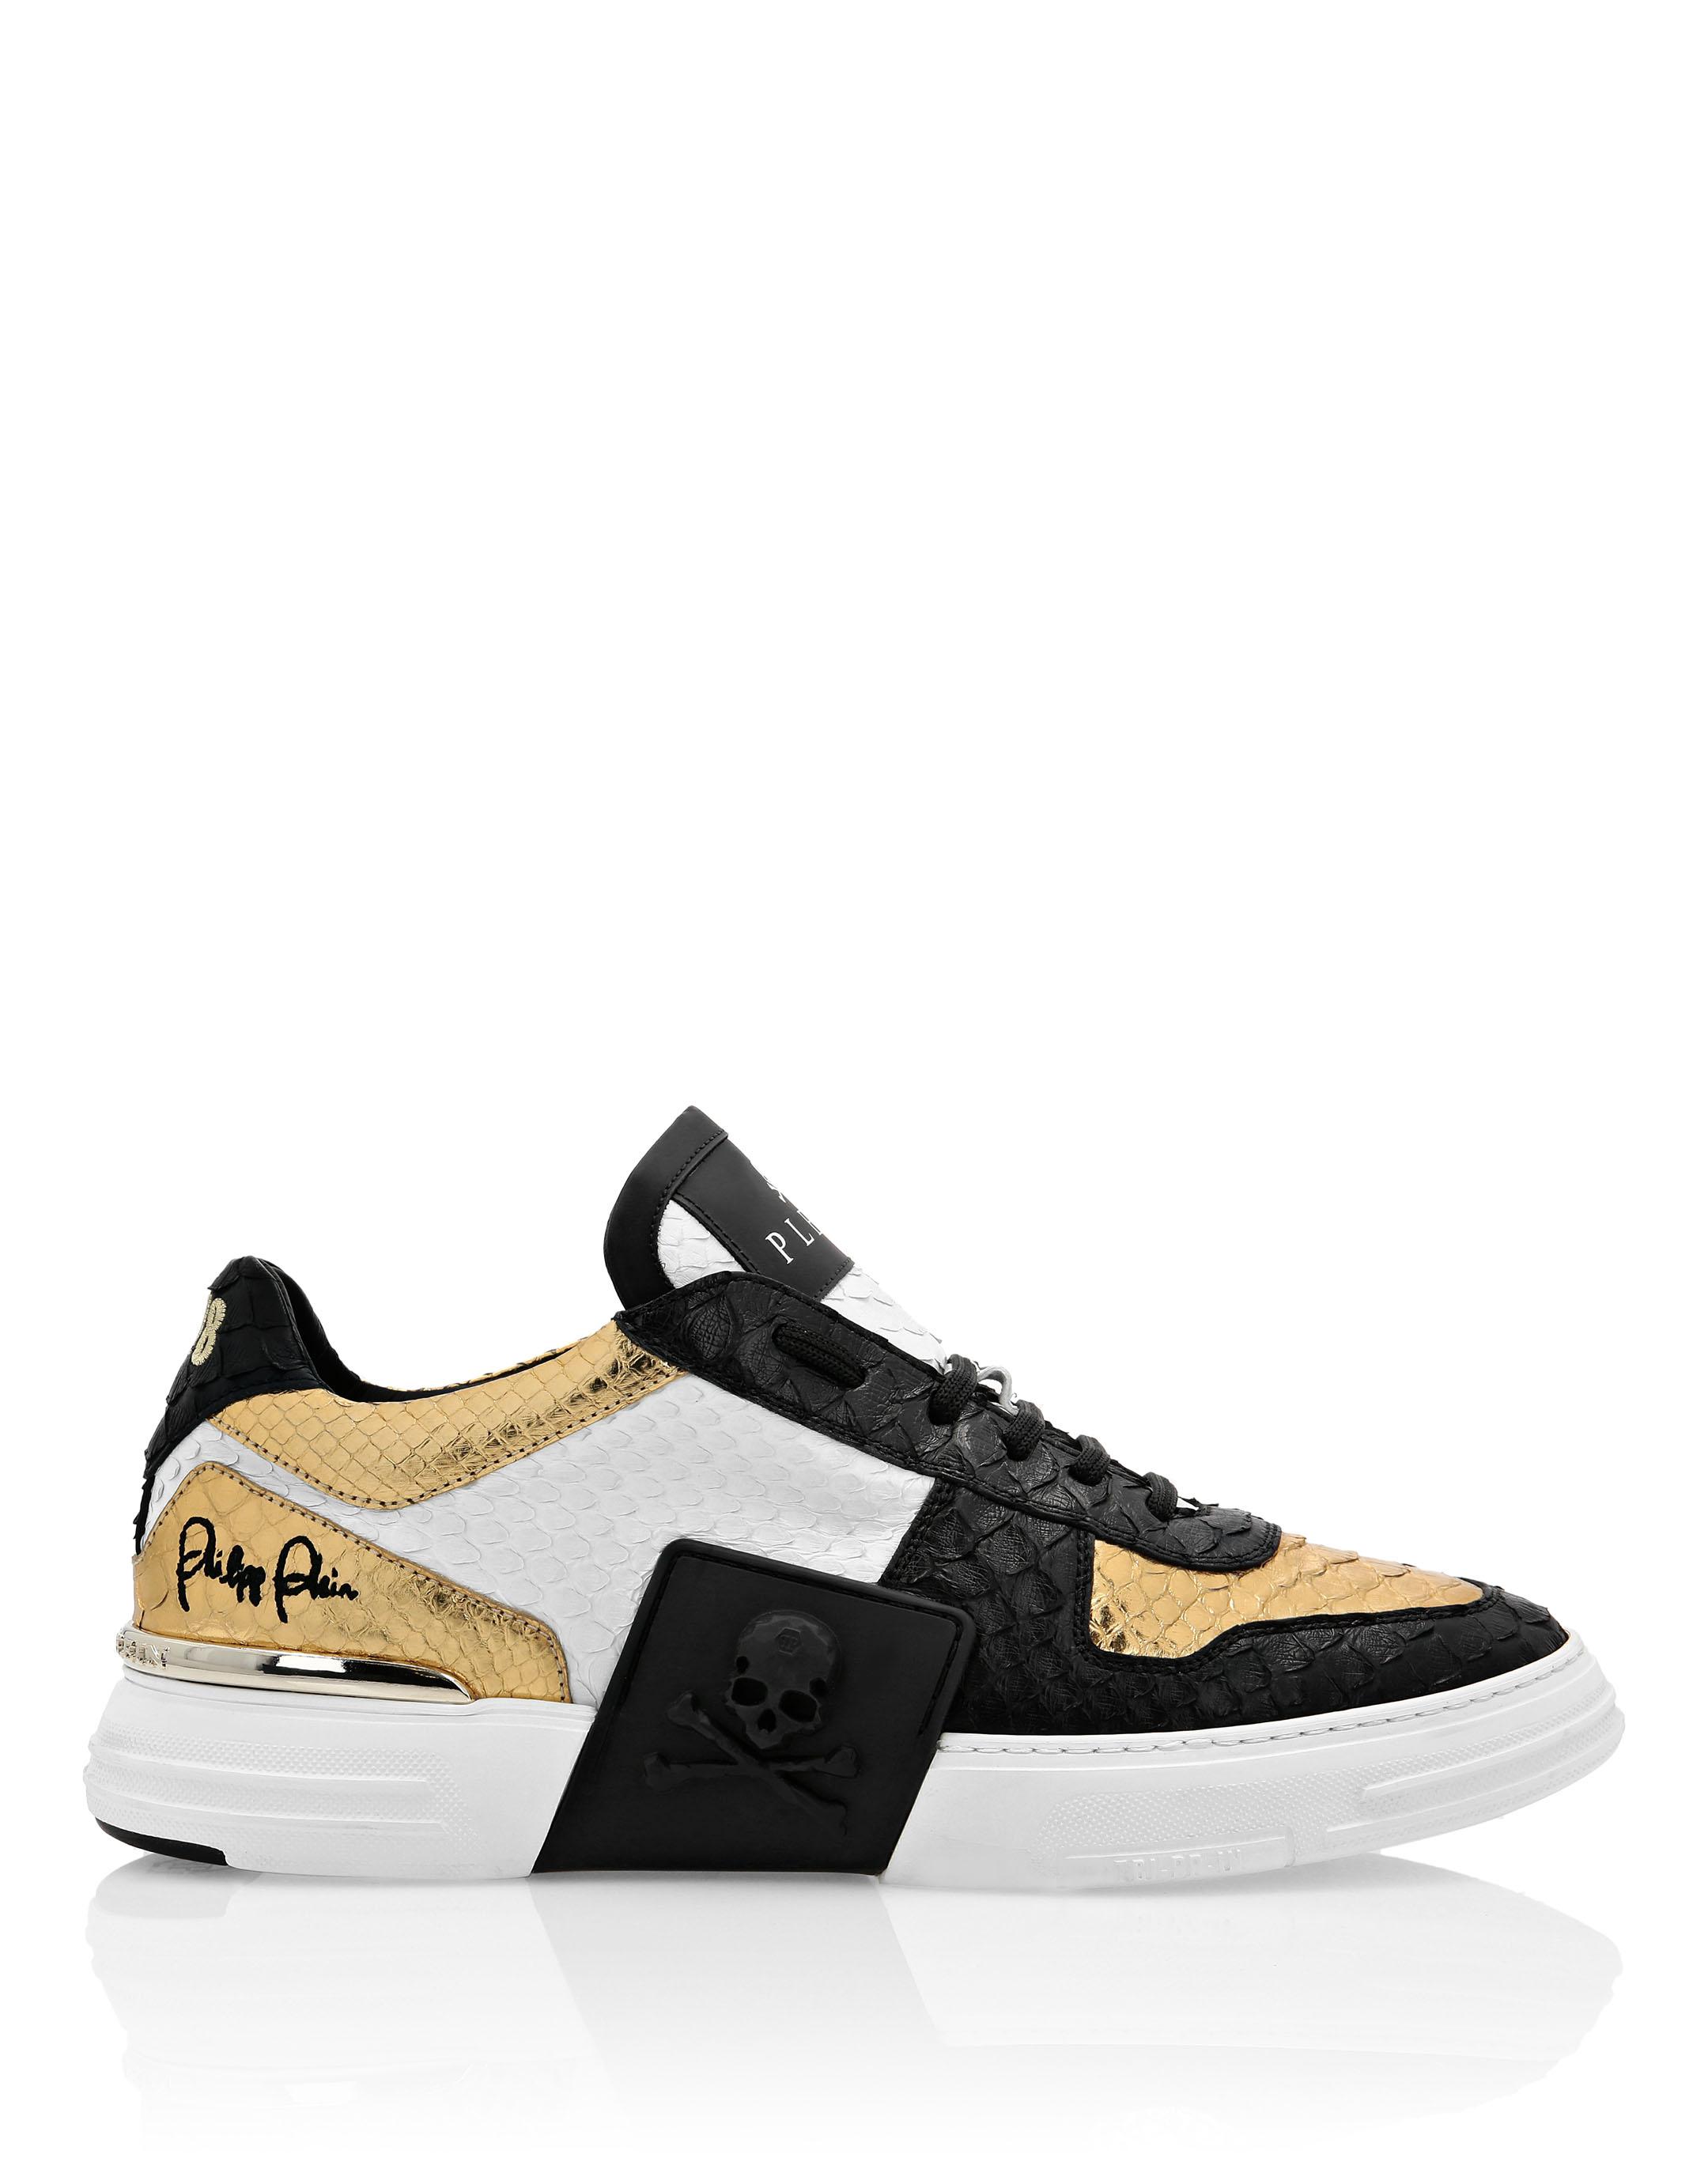 Lo-Top Sneakers Gold | Philipp Plein